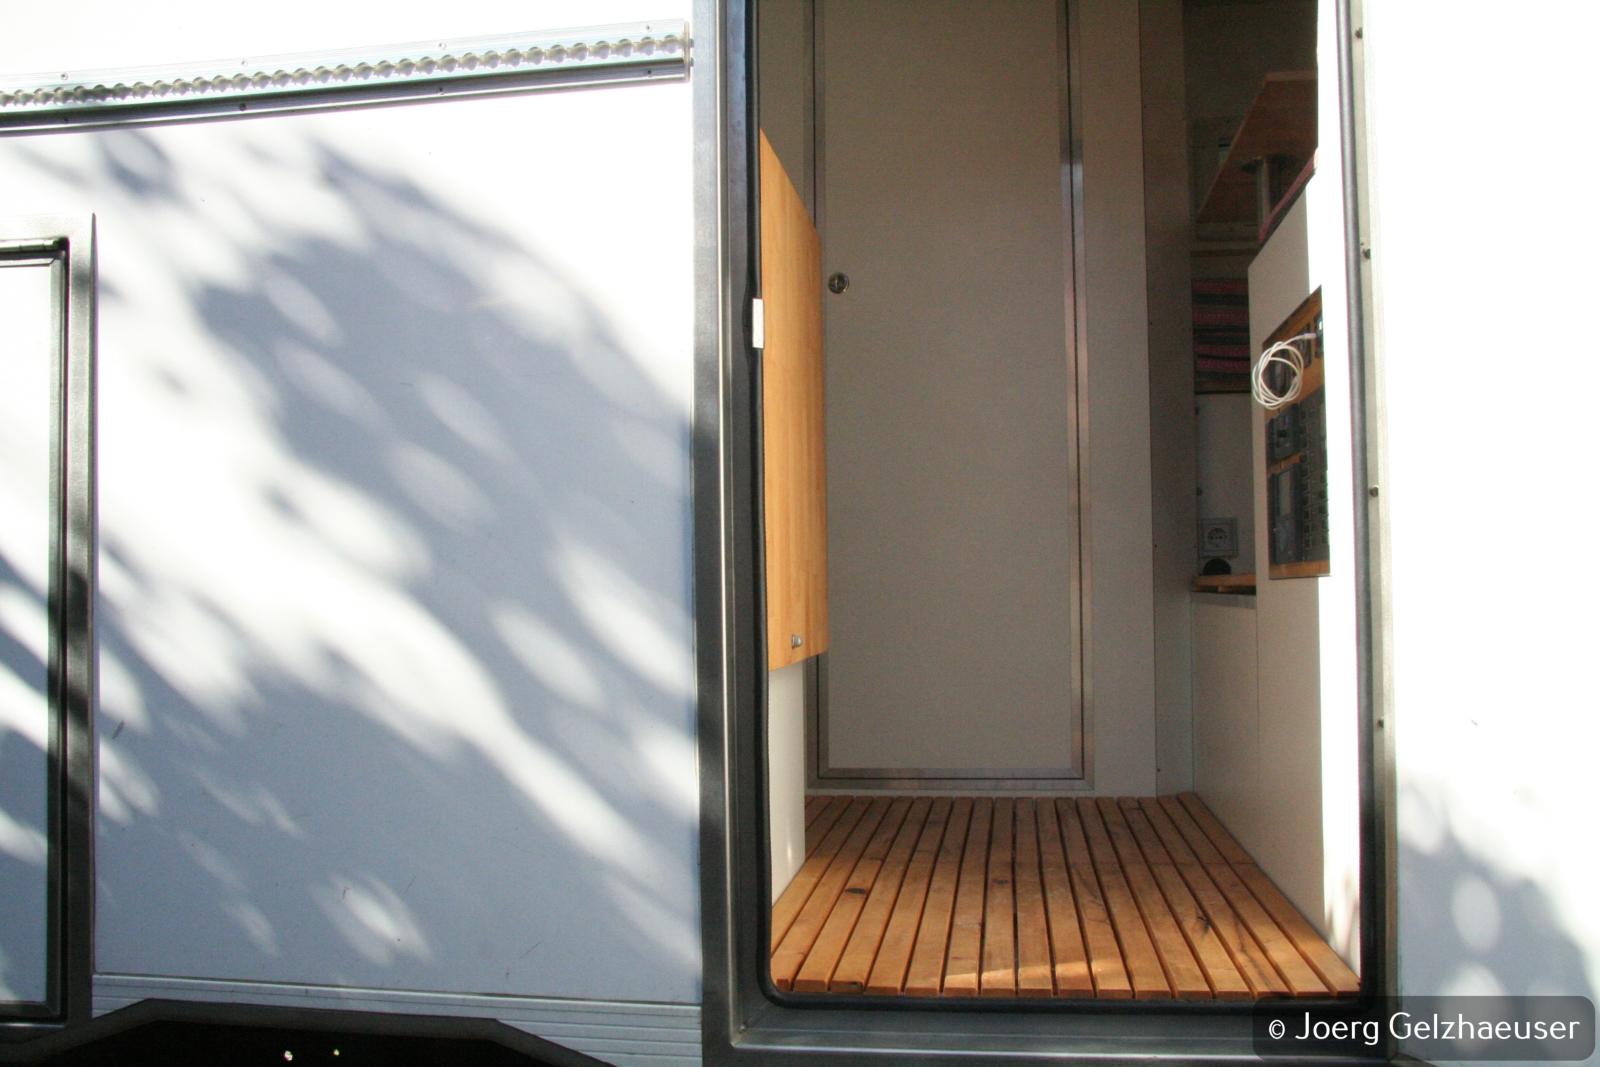 Unimog - Das universelle Motor-(Fernreise)-Gerät - Boden fertiggestellt.